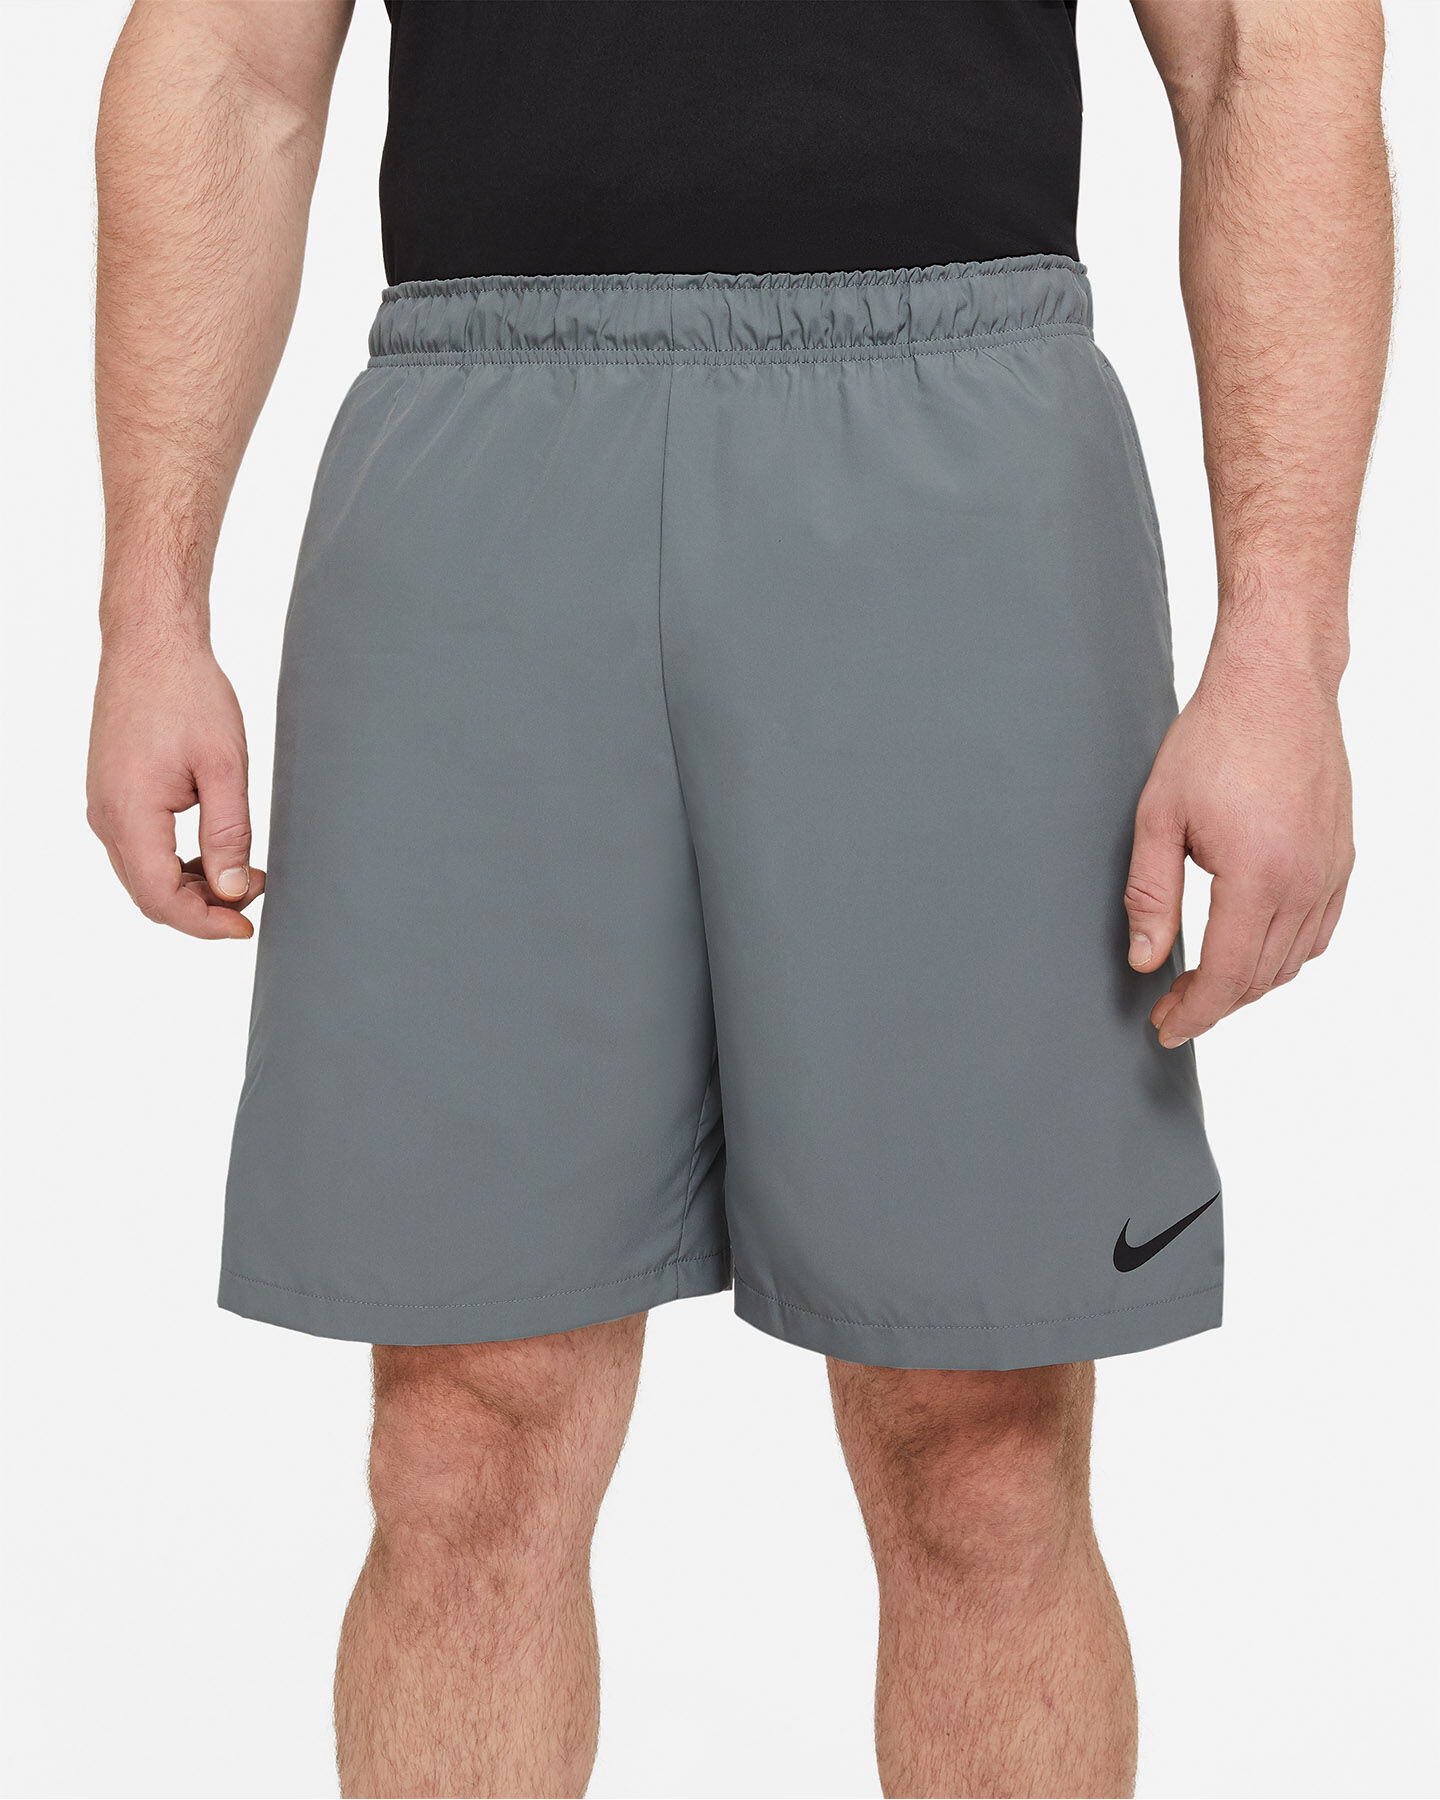 Pantalone training NIKE FLEX 3.0 M S5249100 scatto 2